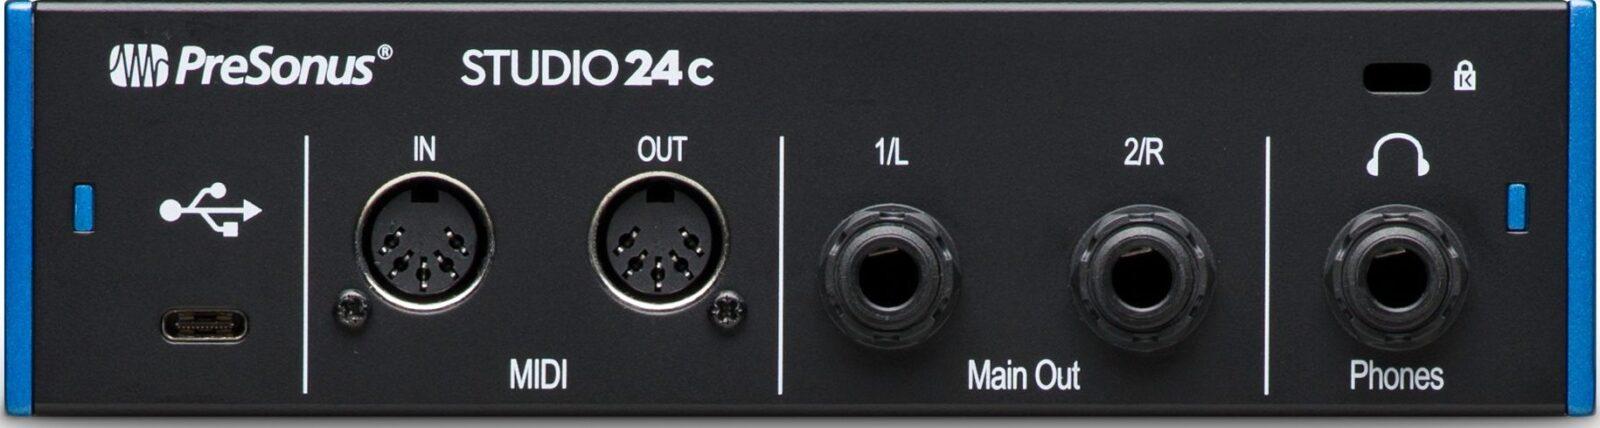 Presonus-Studio-24c usb audio interface